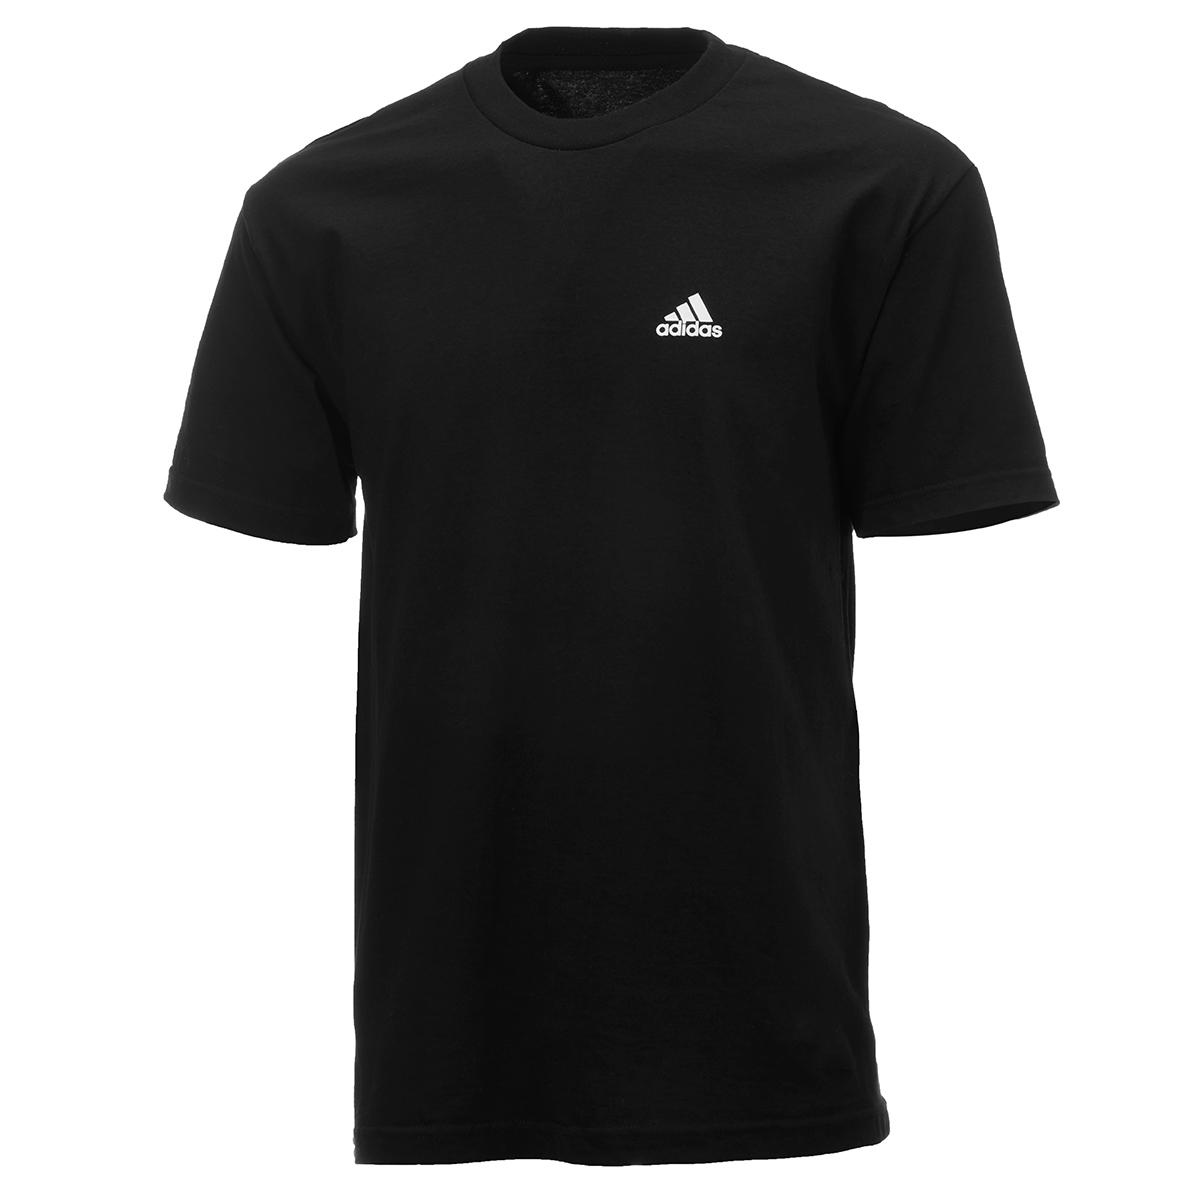 Adidas Men's Performance Short-Sleeve Tee - Black, XXL